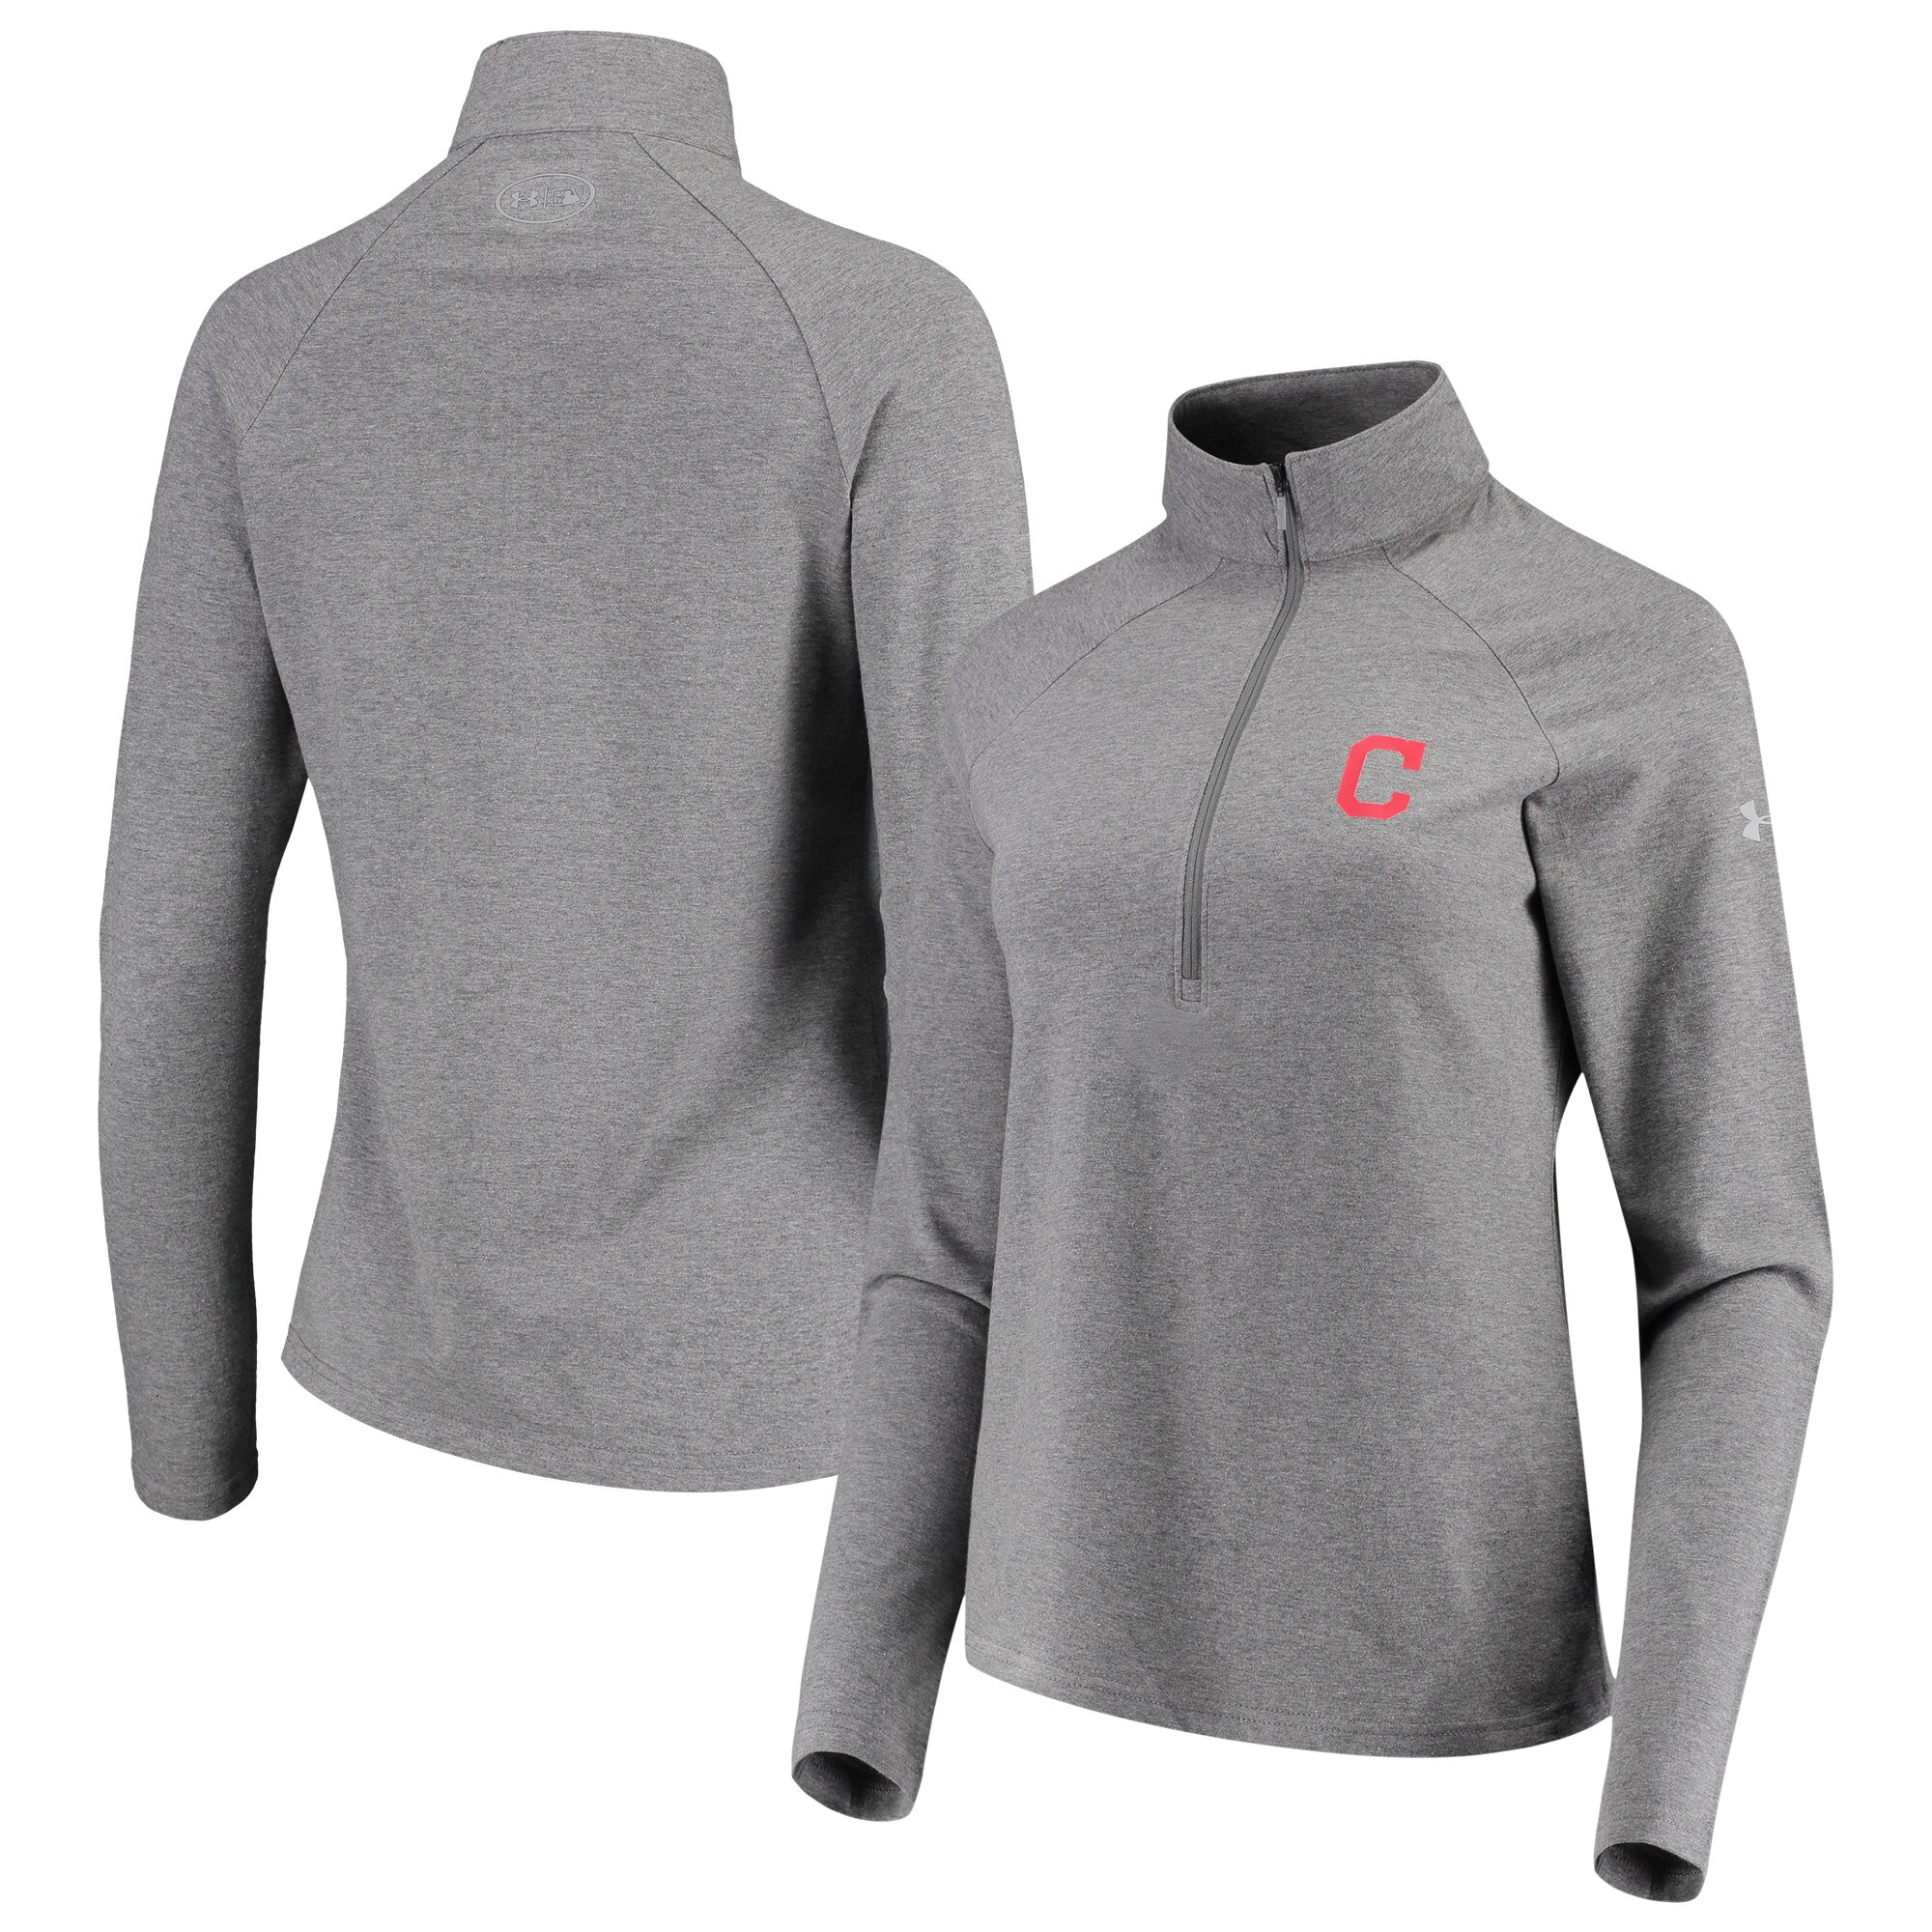 Cleveland Indians Under Armour Women's Passion Performance Tri-Blend Raglan Half-Zip Pullover Jacket - Heathered Gray